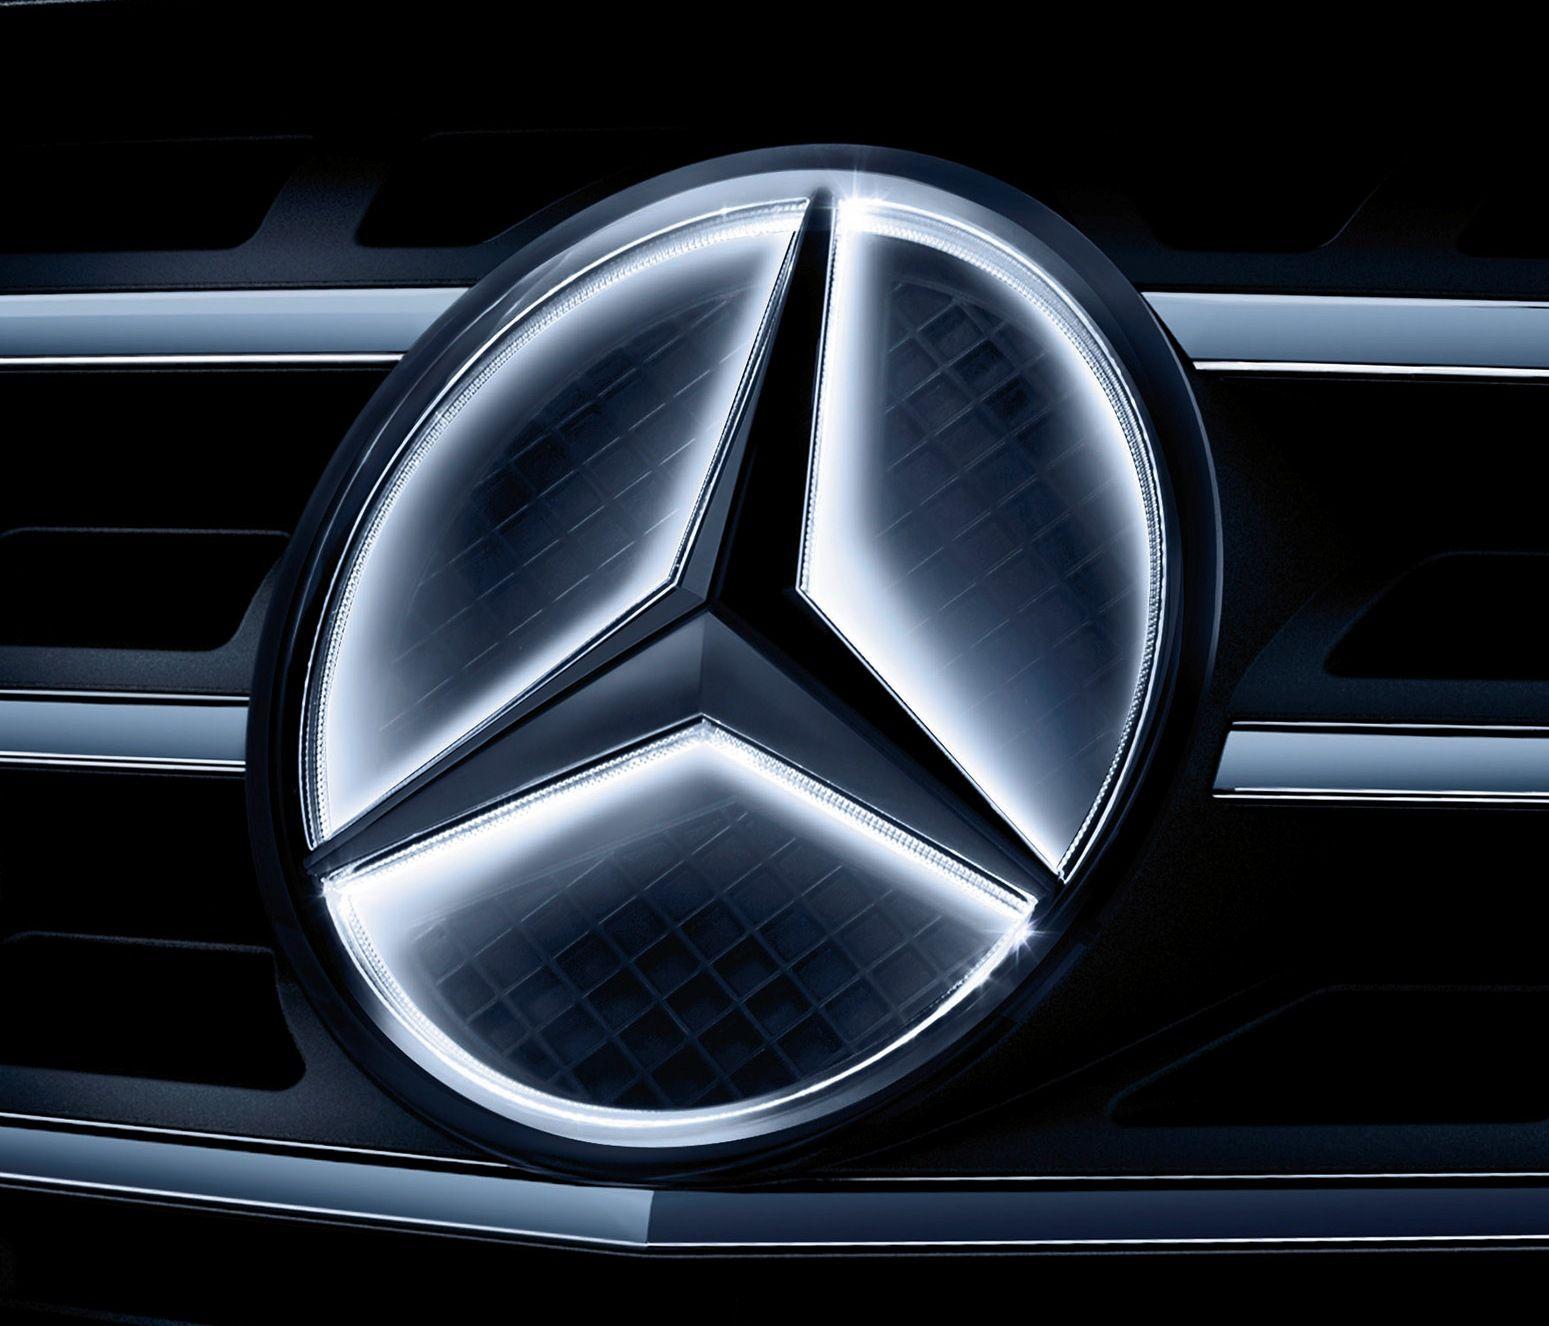 led lit mercedes benz emblem car reviews pinterest